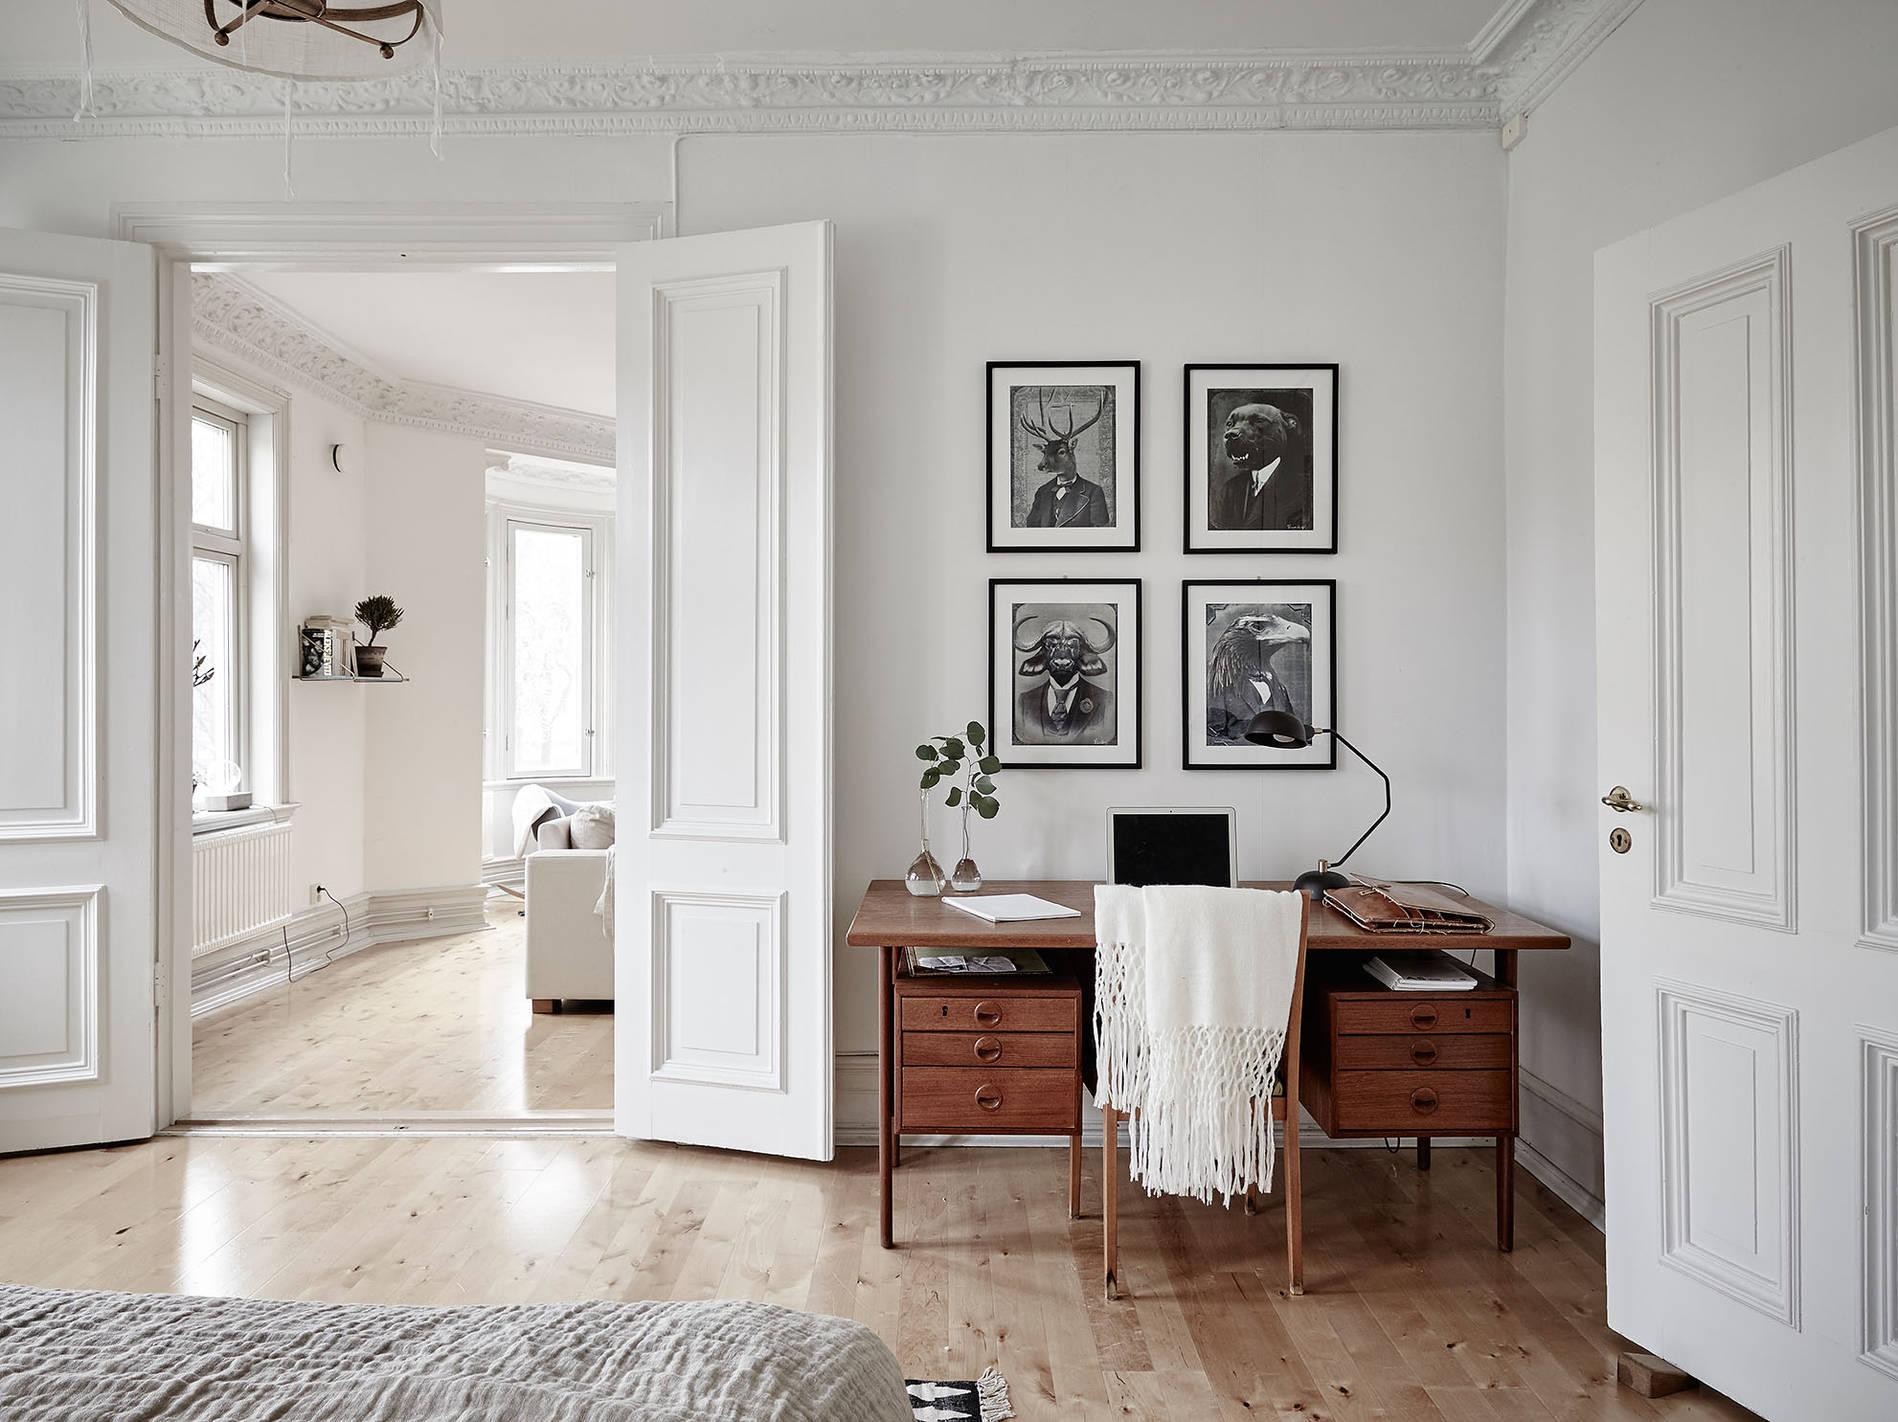 Midcentury modern interior in an old building  COCO LAPINE DESIGNCOCO LAPINE DESIGN